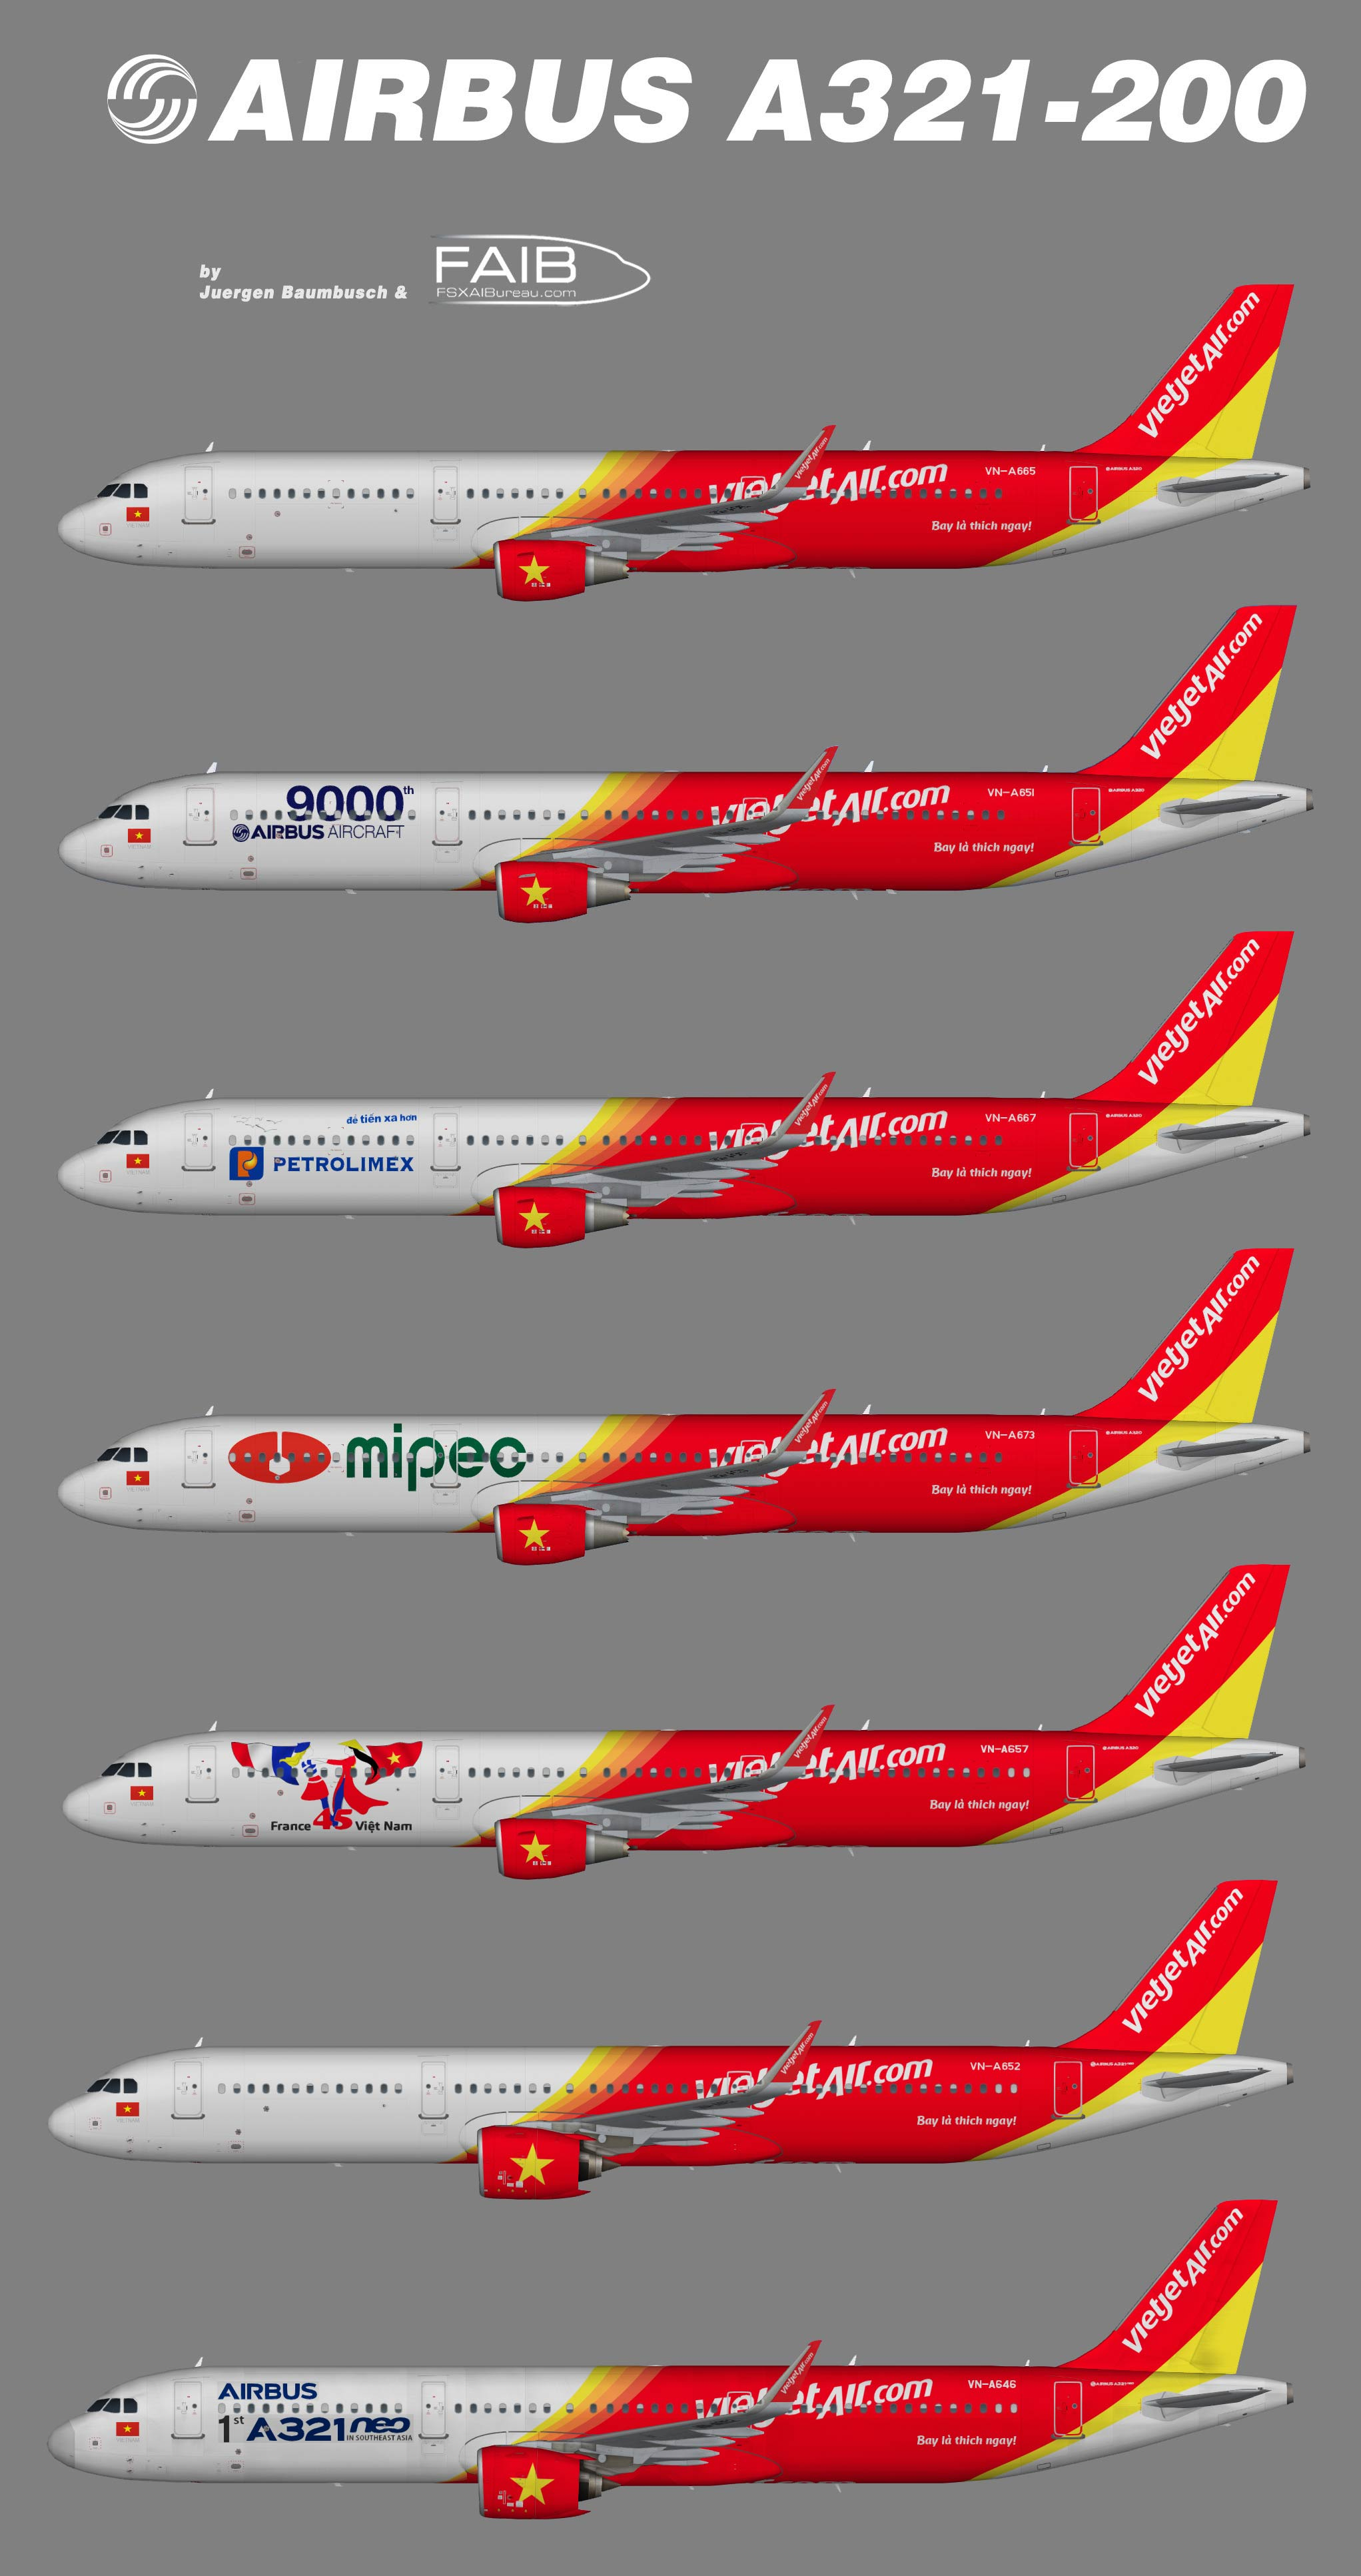 Vietjet Airbus A321-200 Sharklets – Juergen's paint hangar